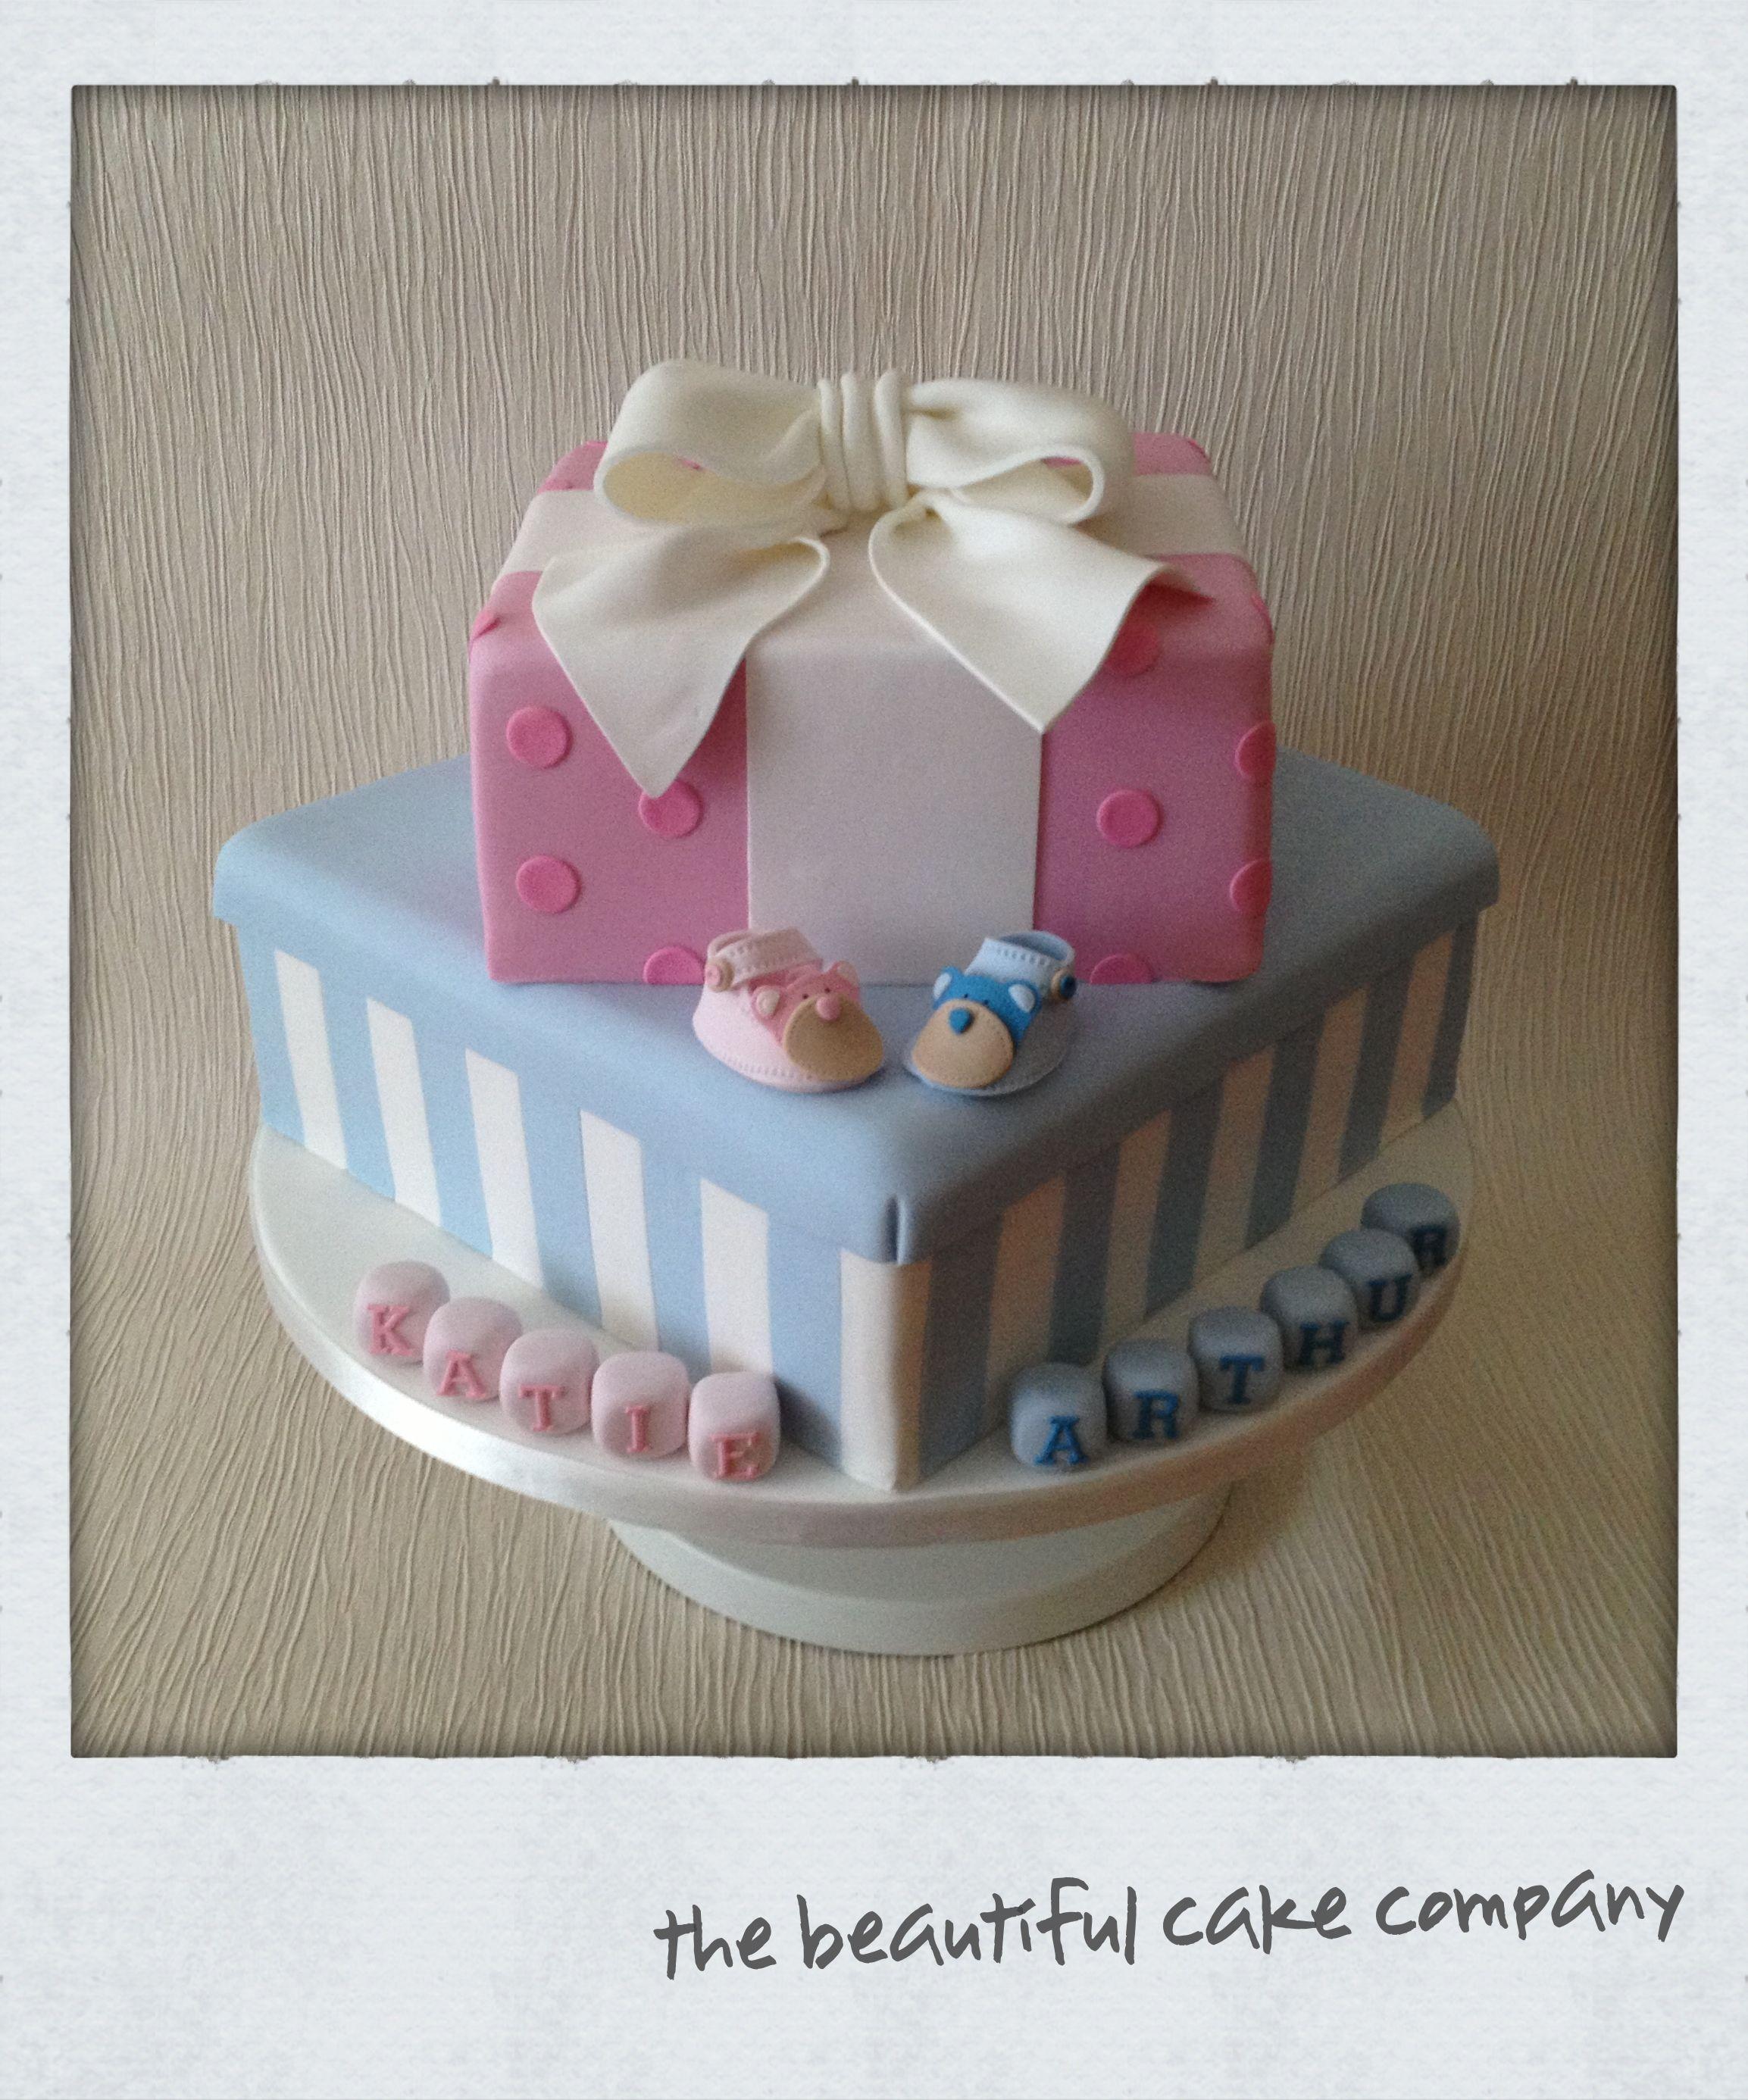 Twin Christening Cake Ebeautifulcakecompany Weebly